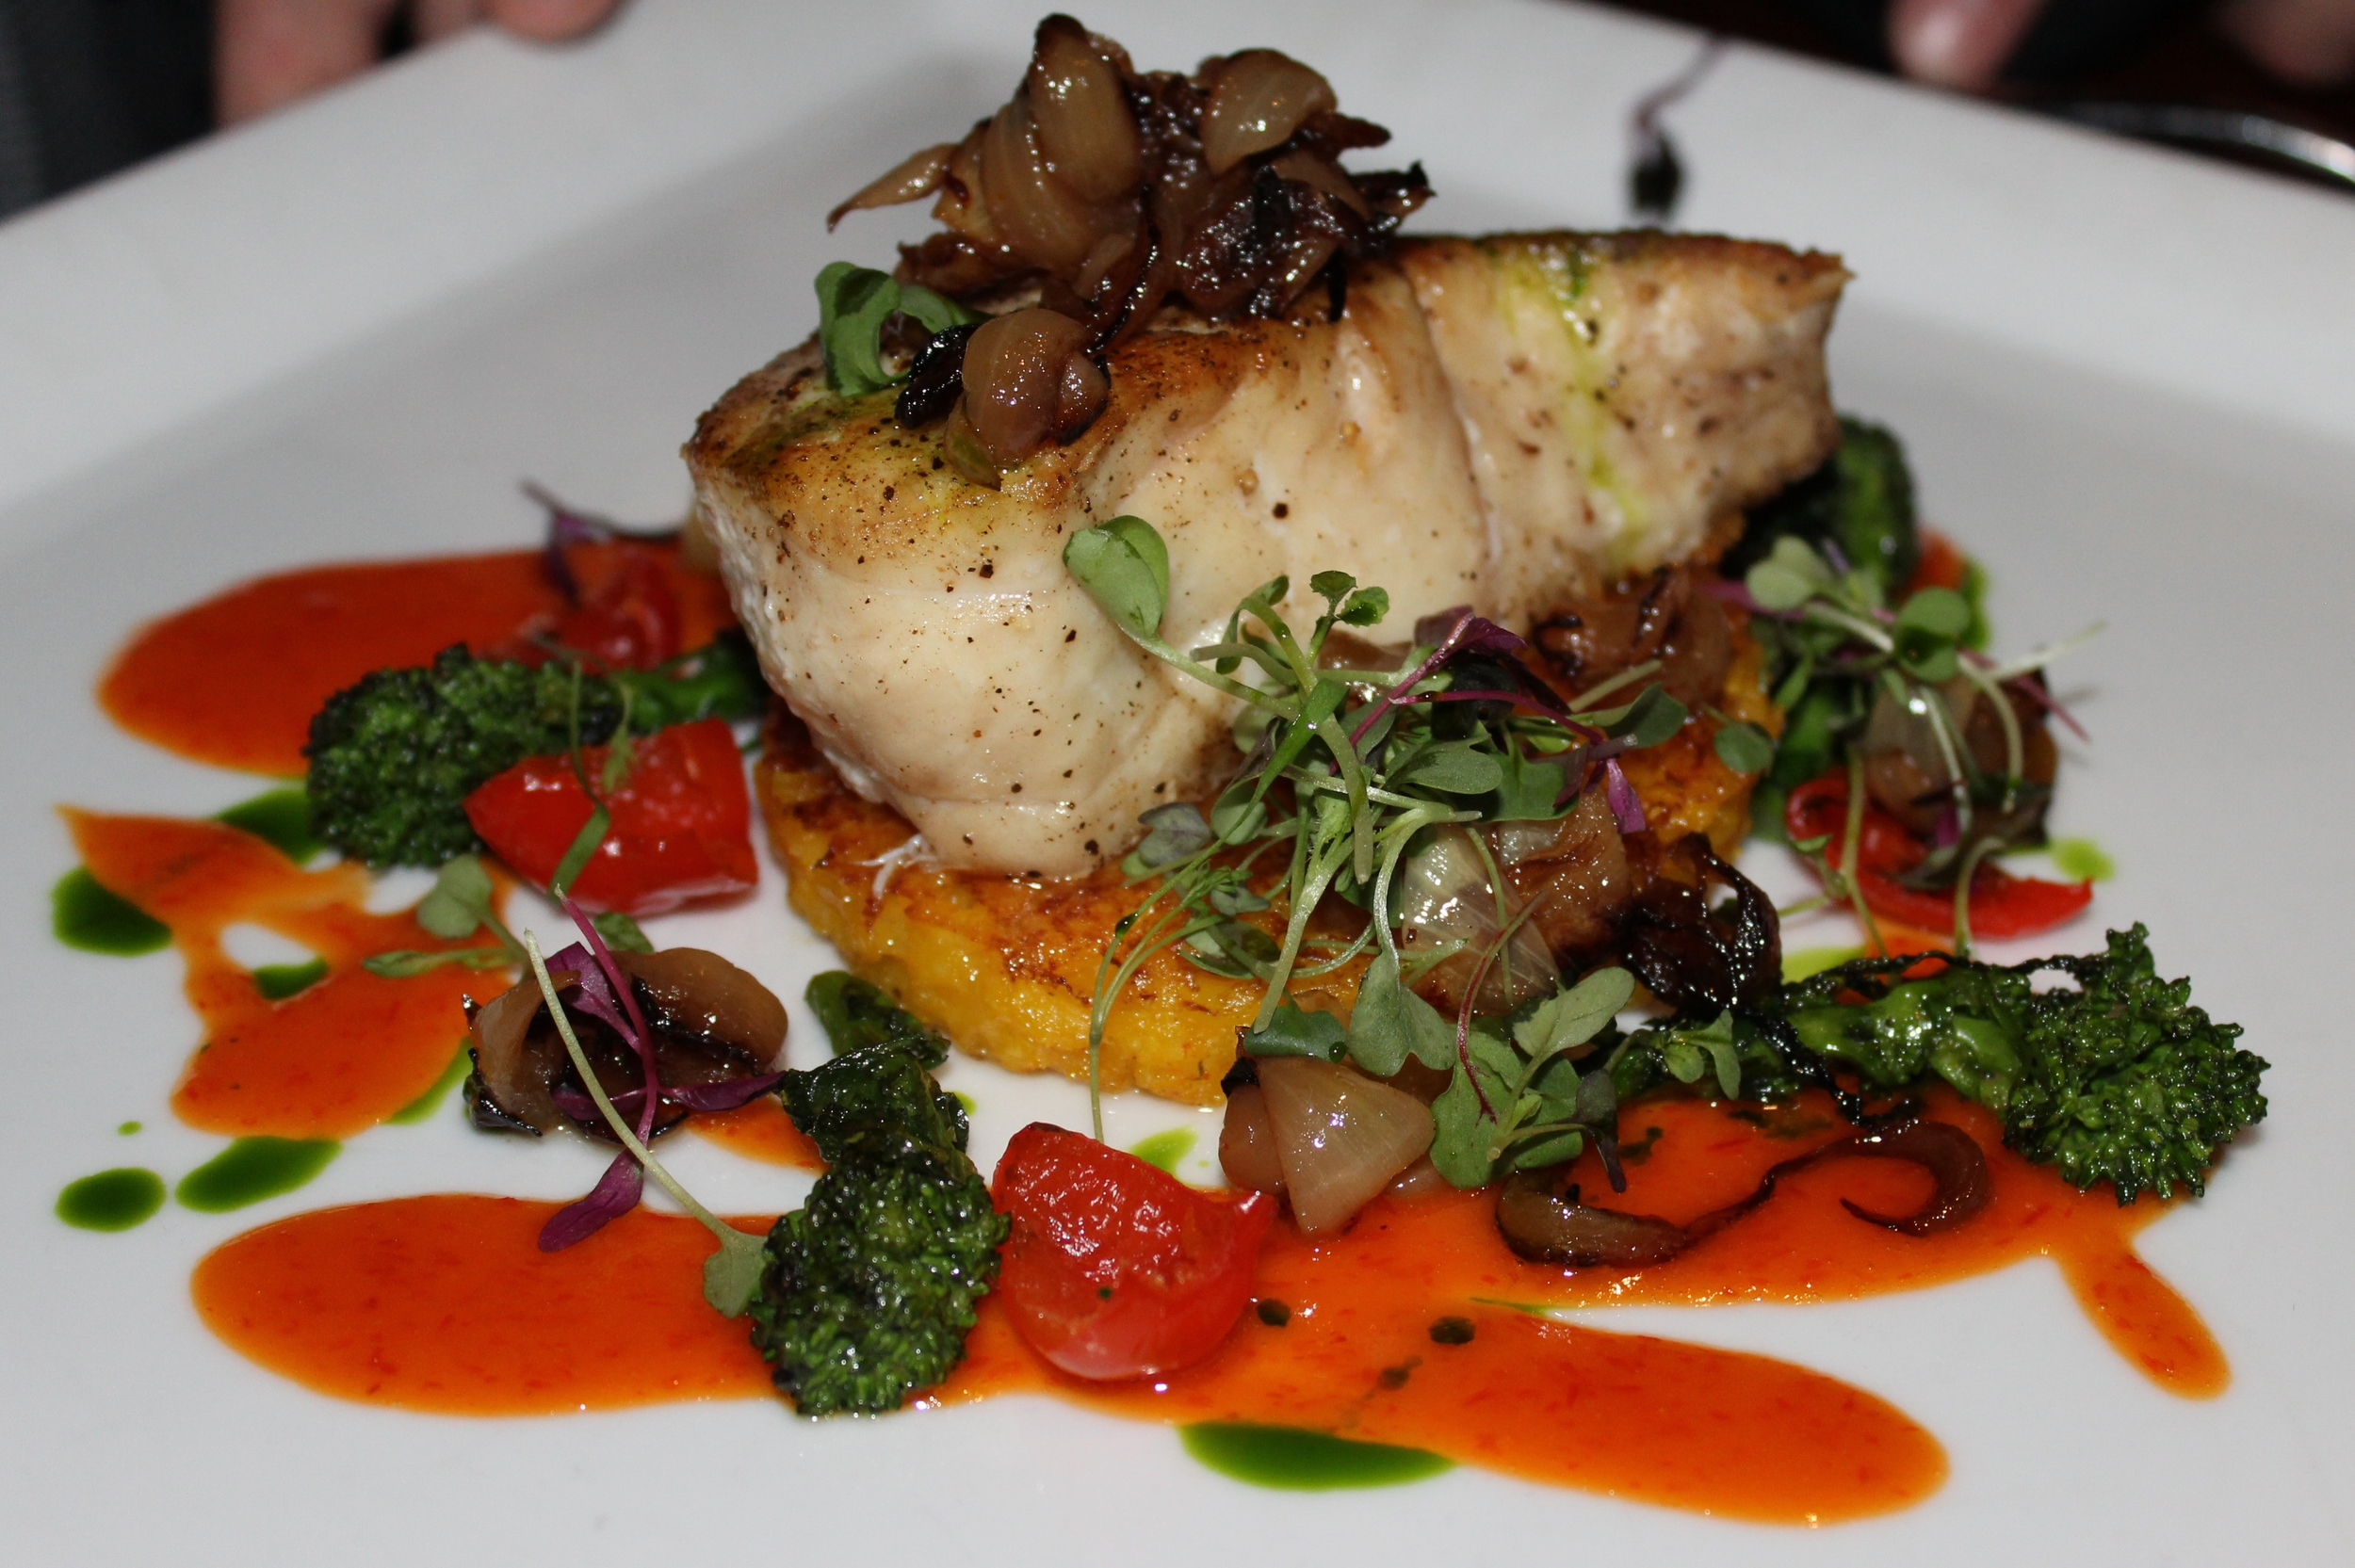 Seared Blue Nose Sea Bass with Crispy Saffron Parmesan Risotto Cake, Rapini, Cipollini Onions, and Peppadew Pepper Reduction